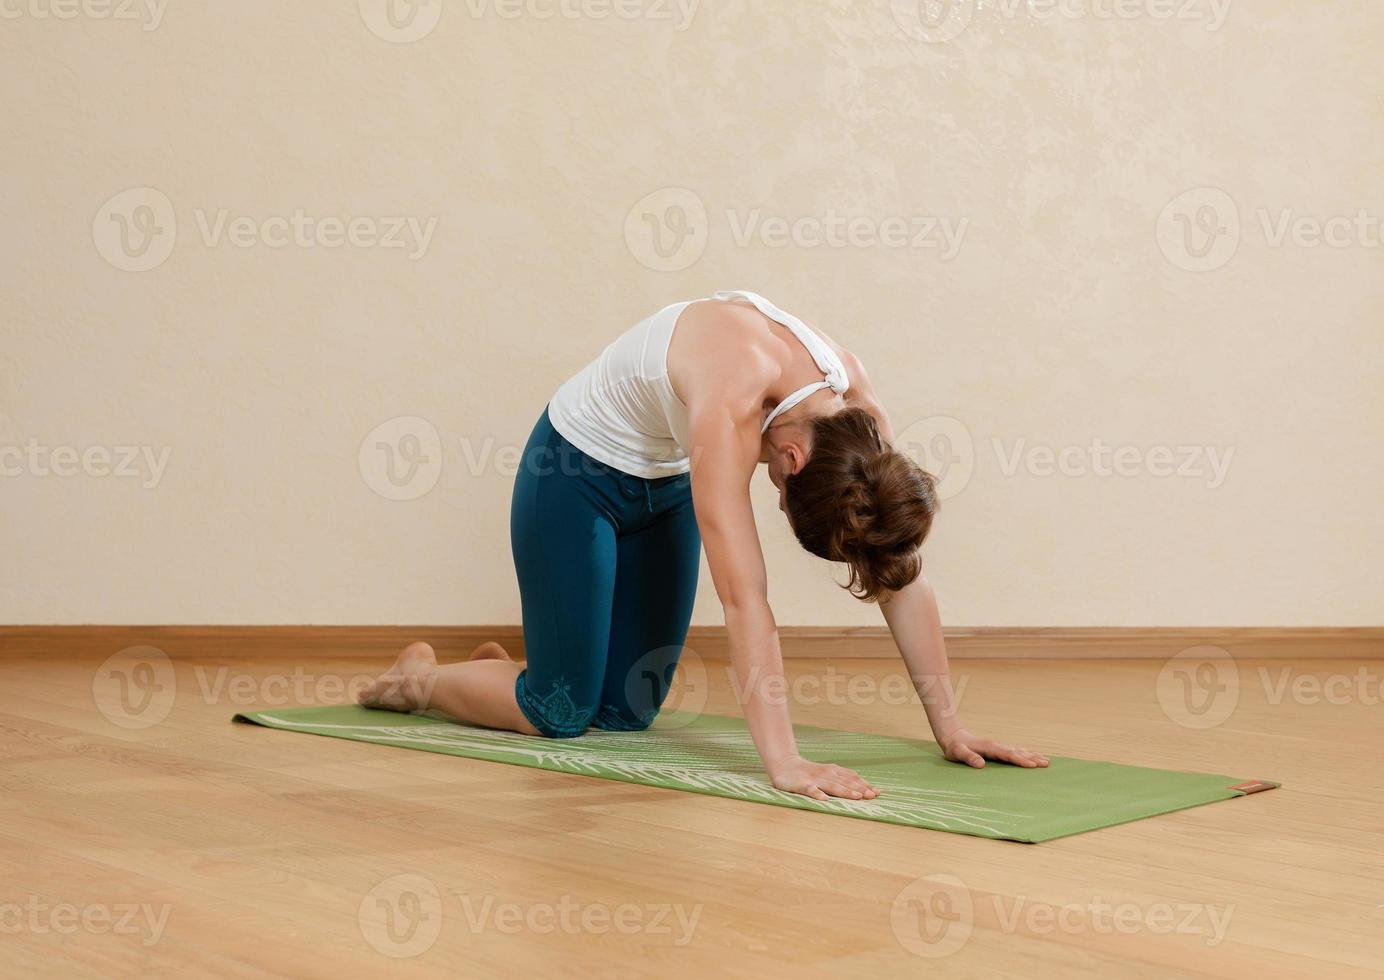 kaukasisk kvinna utövar yoga i studion (goasana) foto